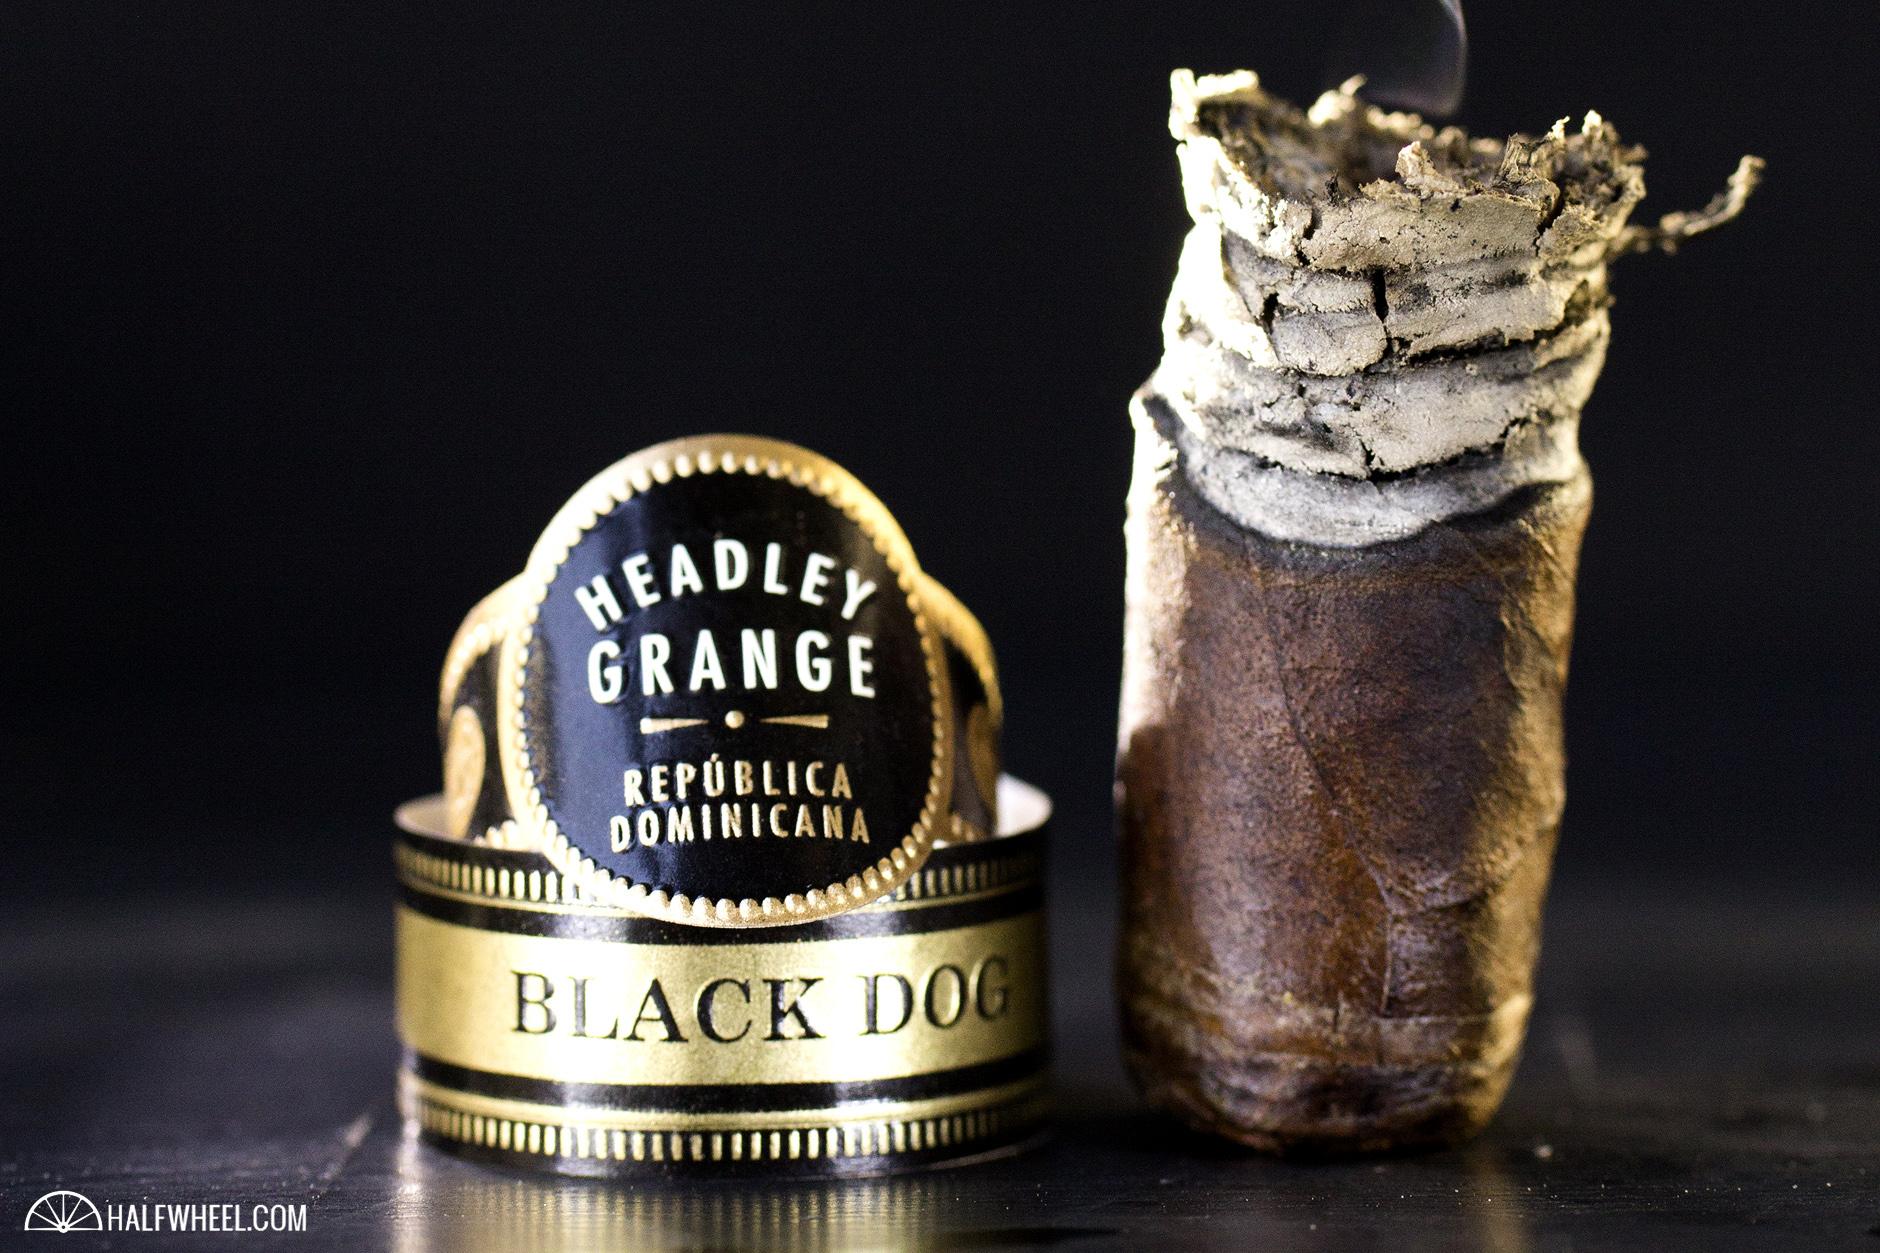 Headley Grange Black Dog